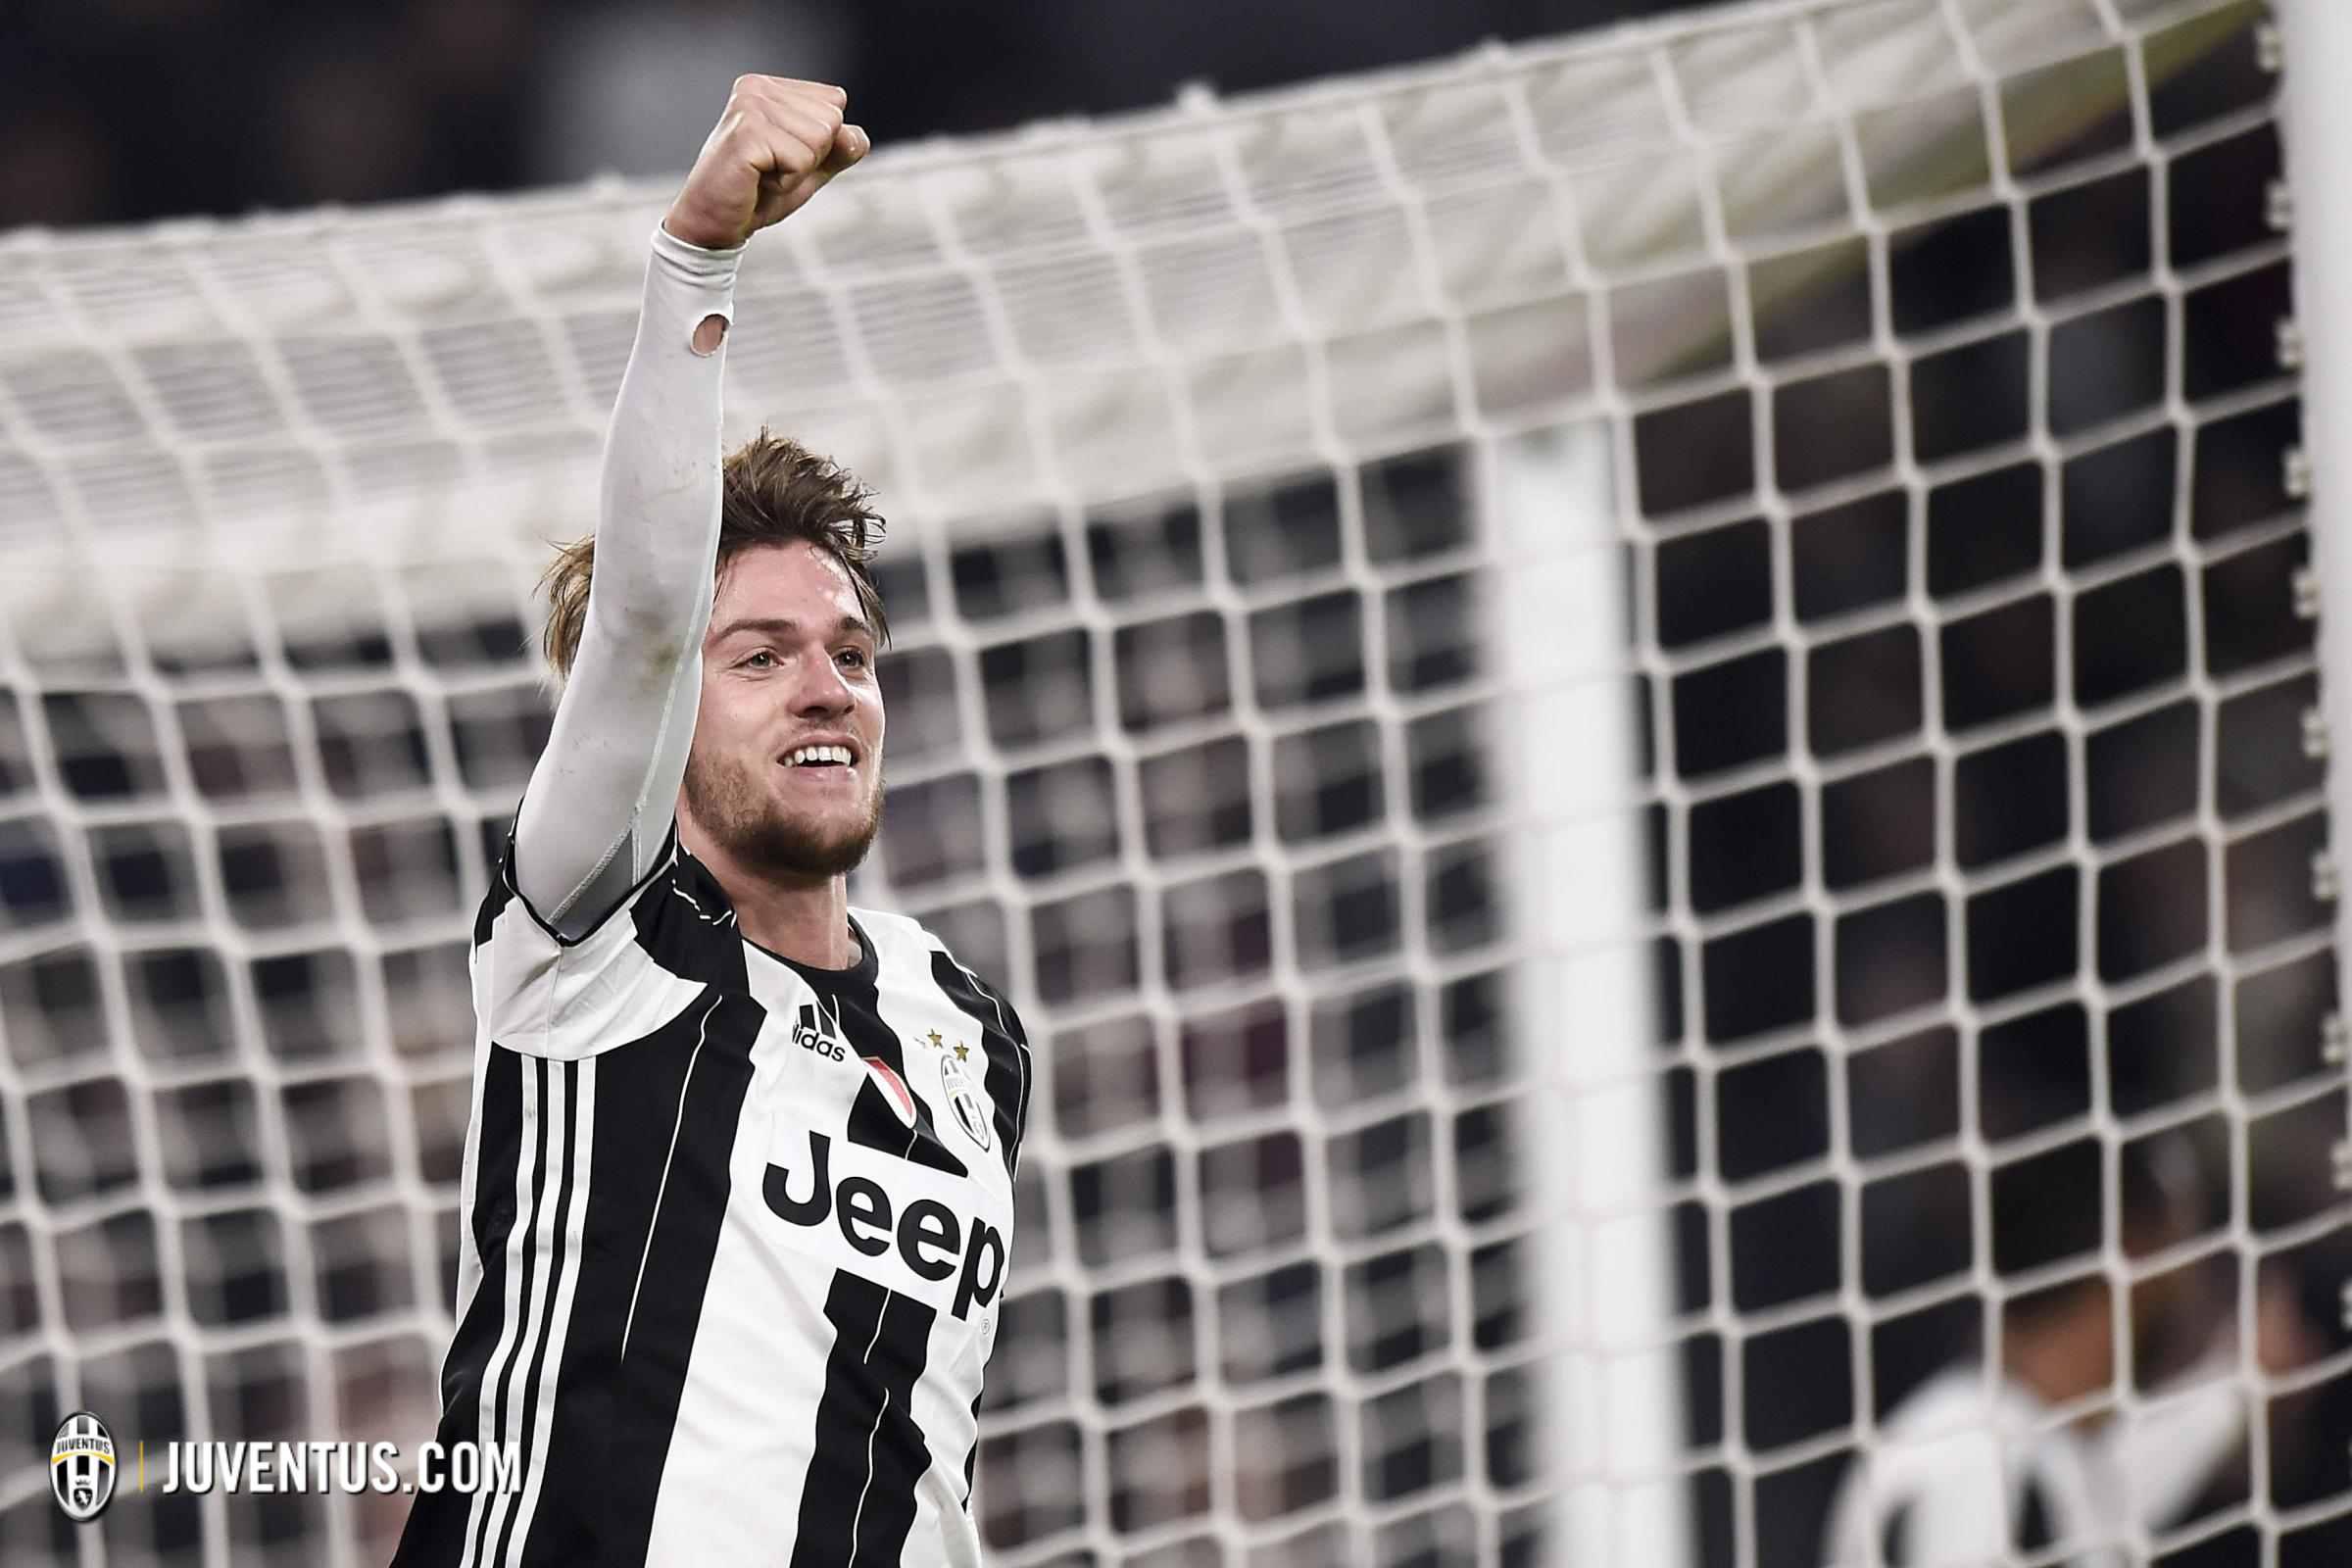 OFFICIAL: Daniele Rugani renews Juventus contract -Juvefc.com2400 x 1600